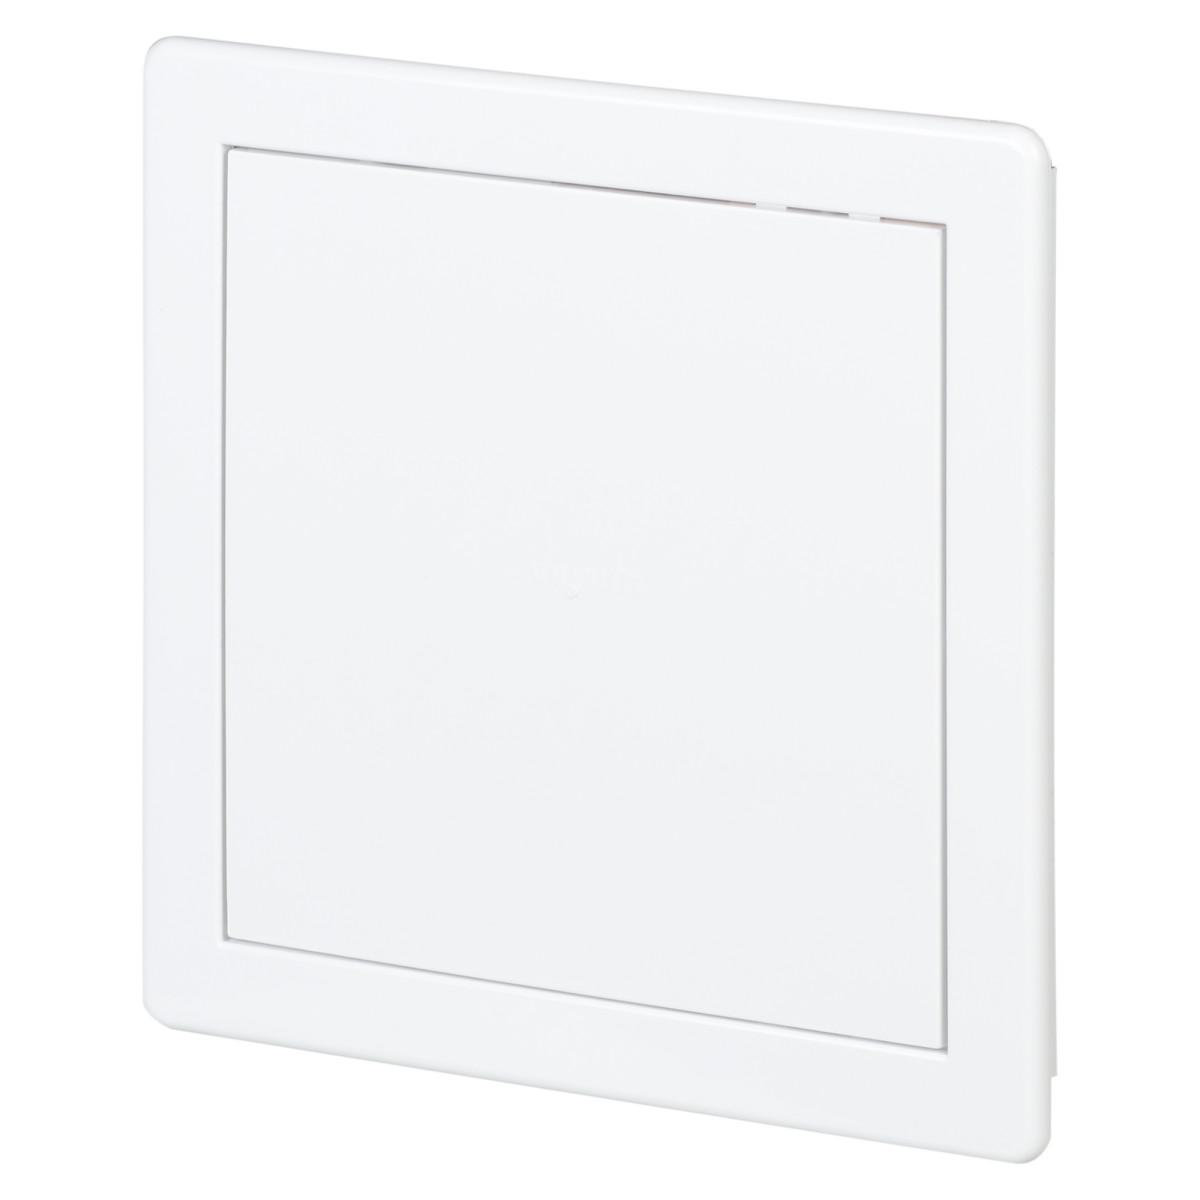 Люк ревизионный Awenta DT12 20х20 см цвет белый